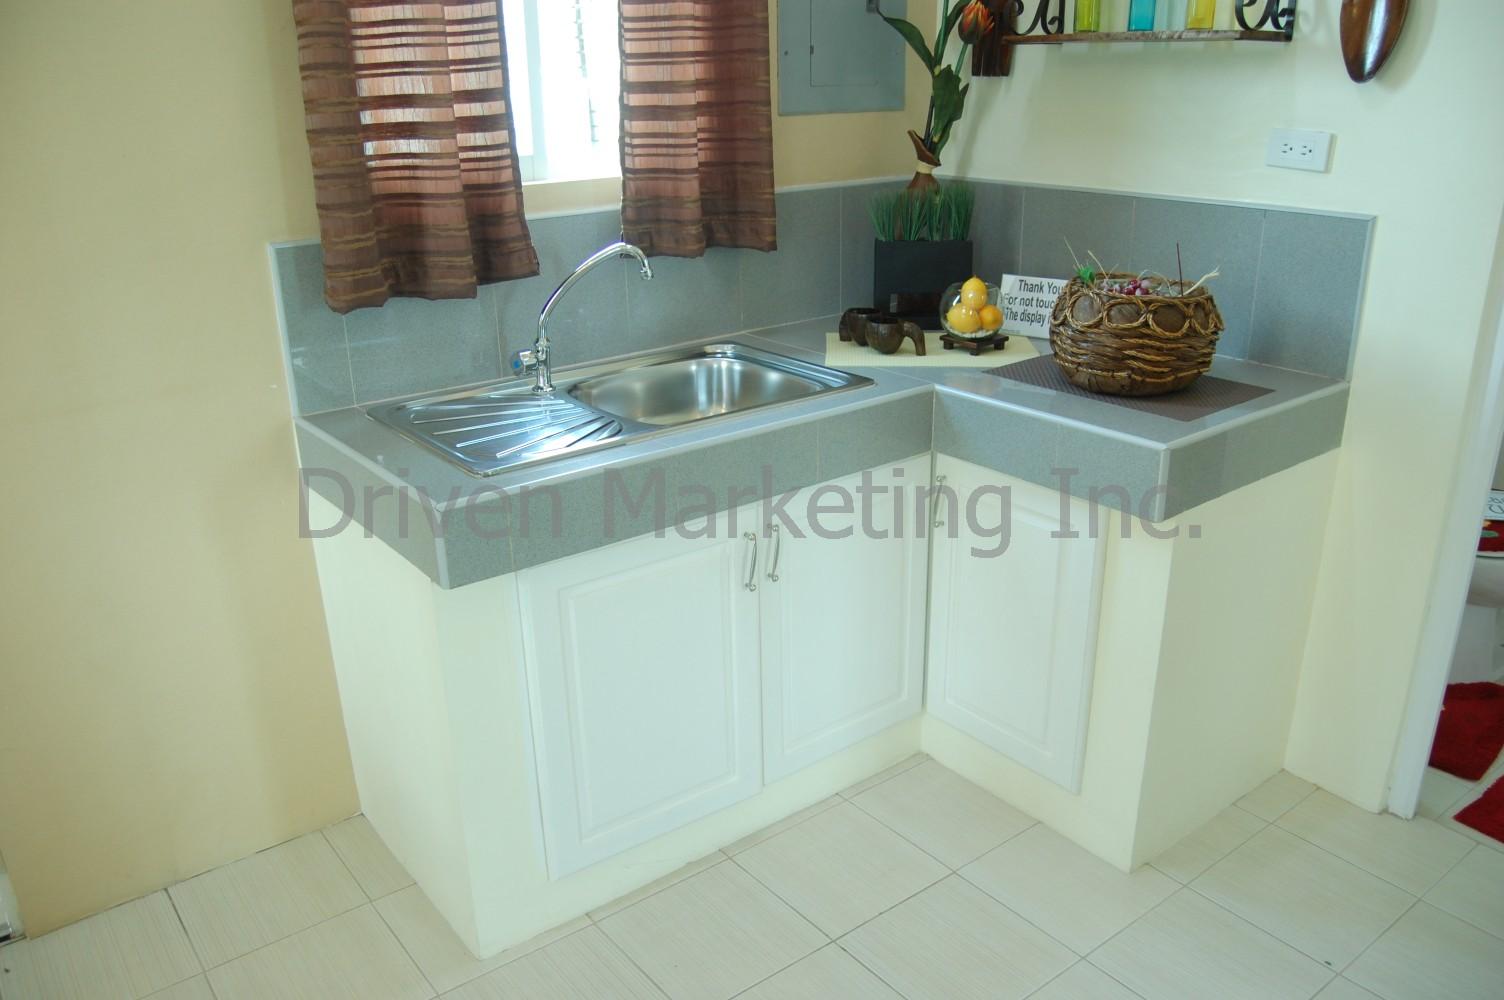 Washington place dasmarinas dasma cavite philippines modern house design affordable rent to own wynnie 27 jpg